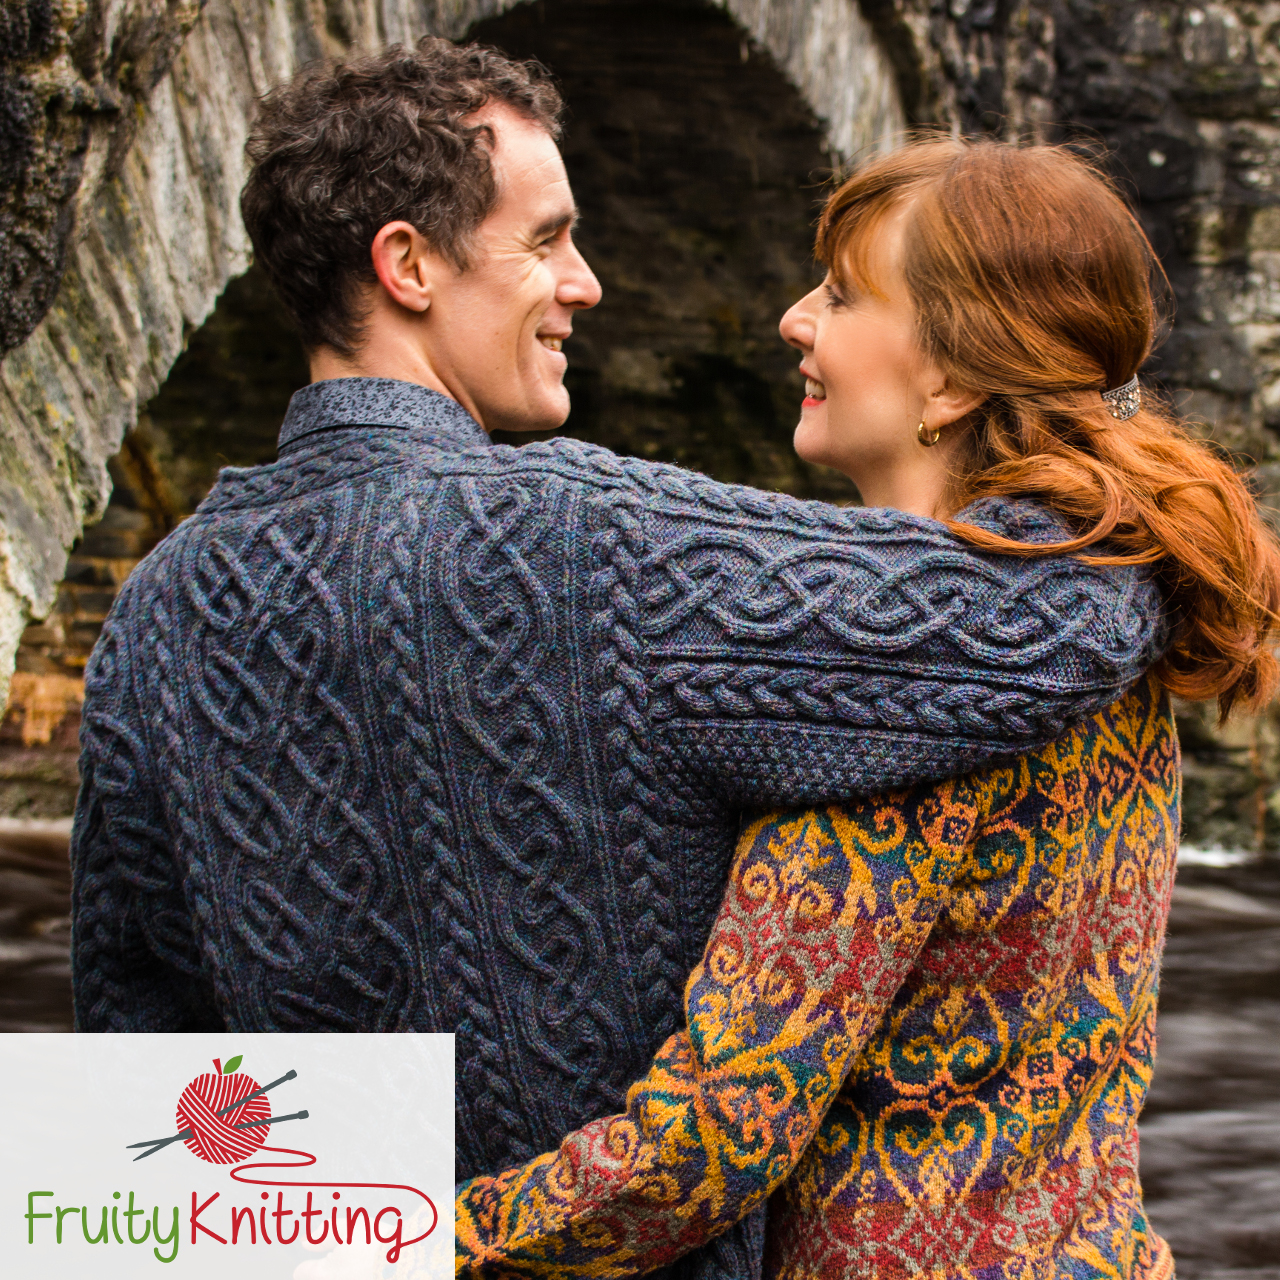 FruityKnittingPodcast.jpg